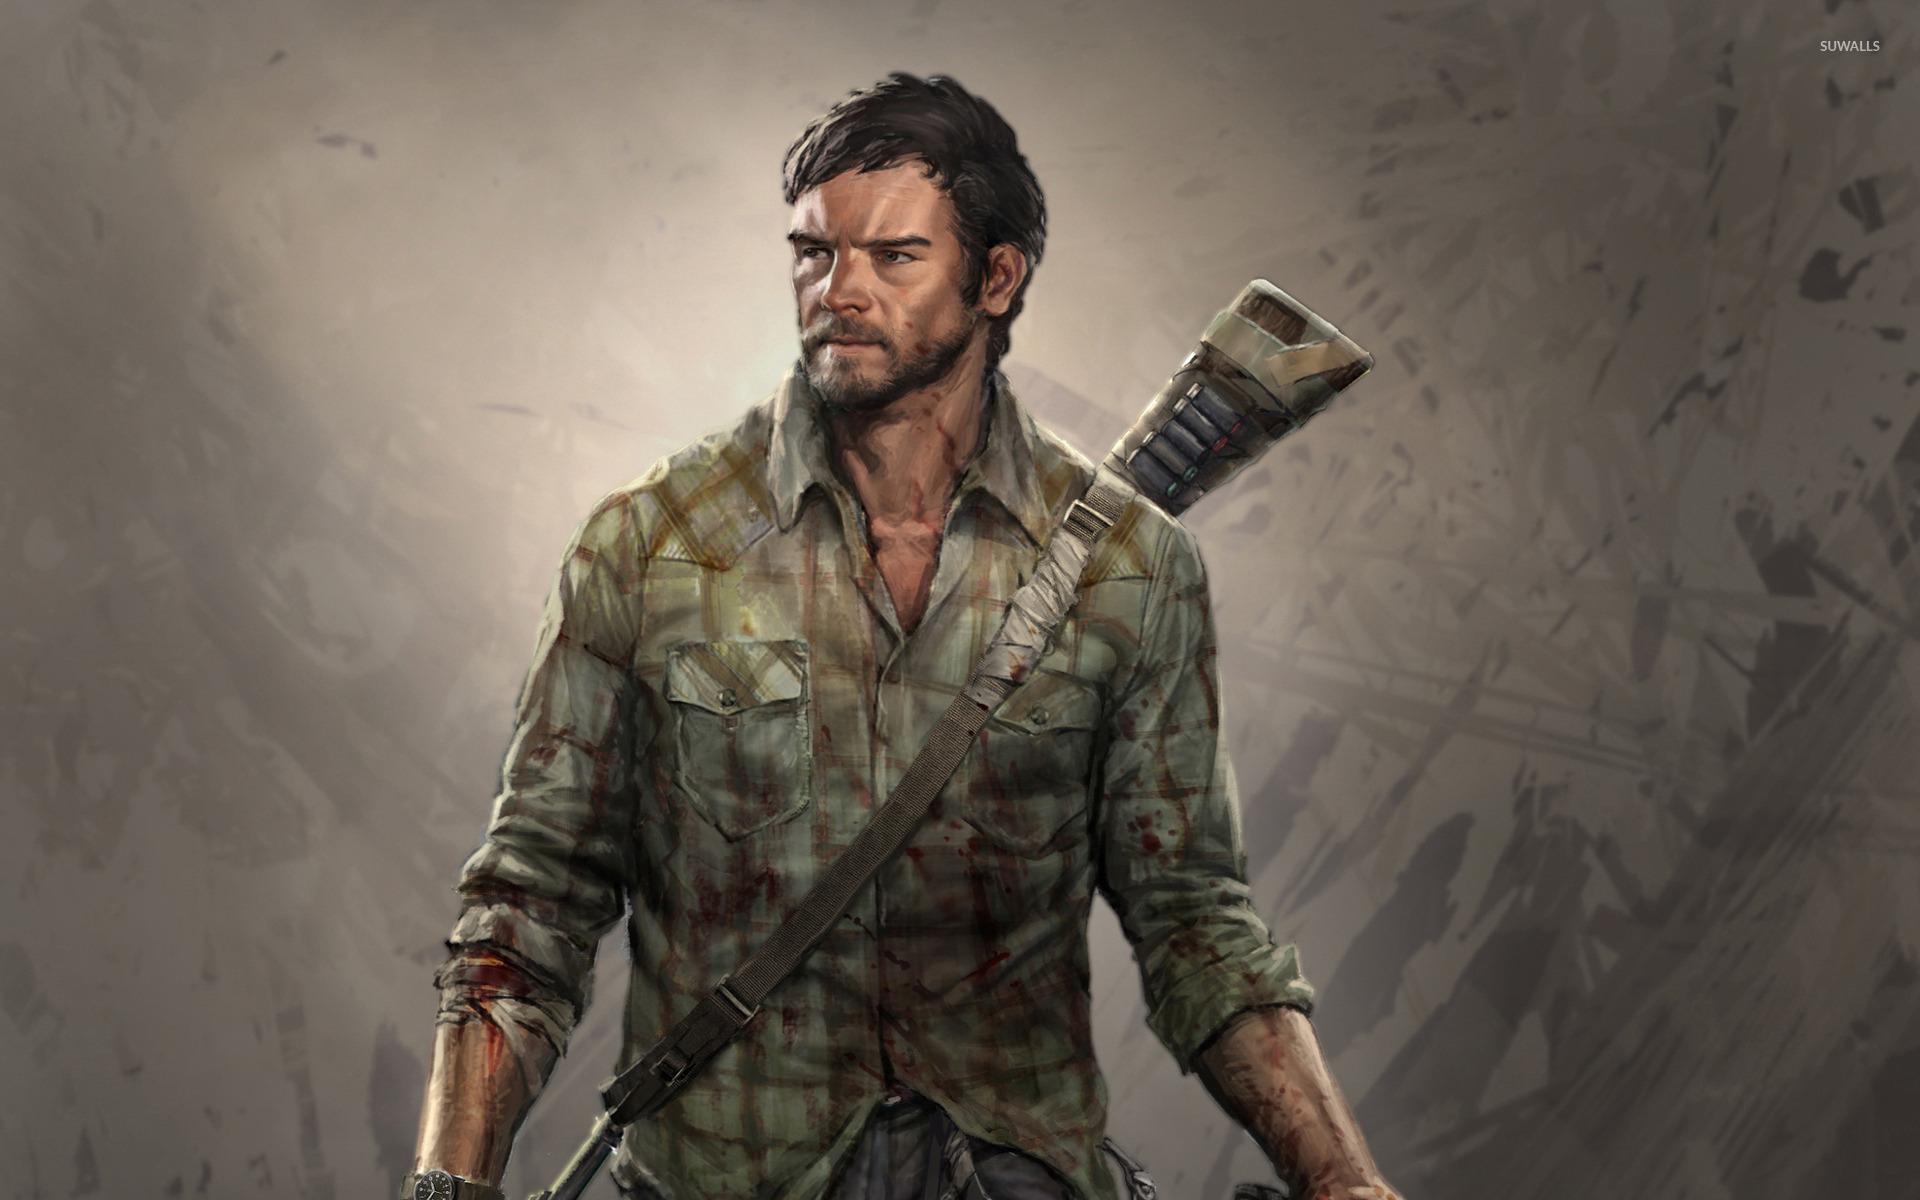 Joel - The Last of Us wallpaper - Game wallpapers - #20911